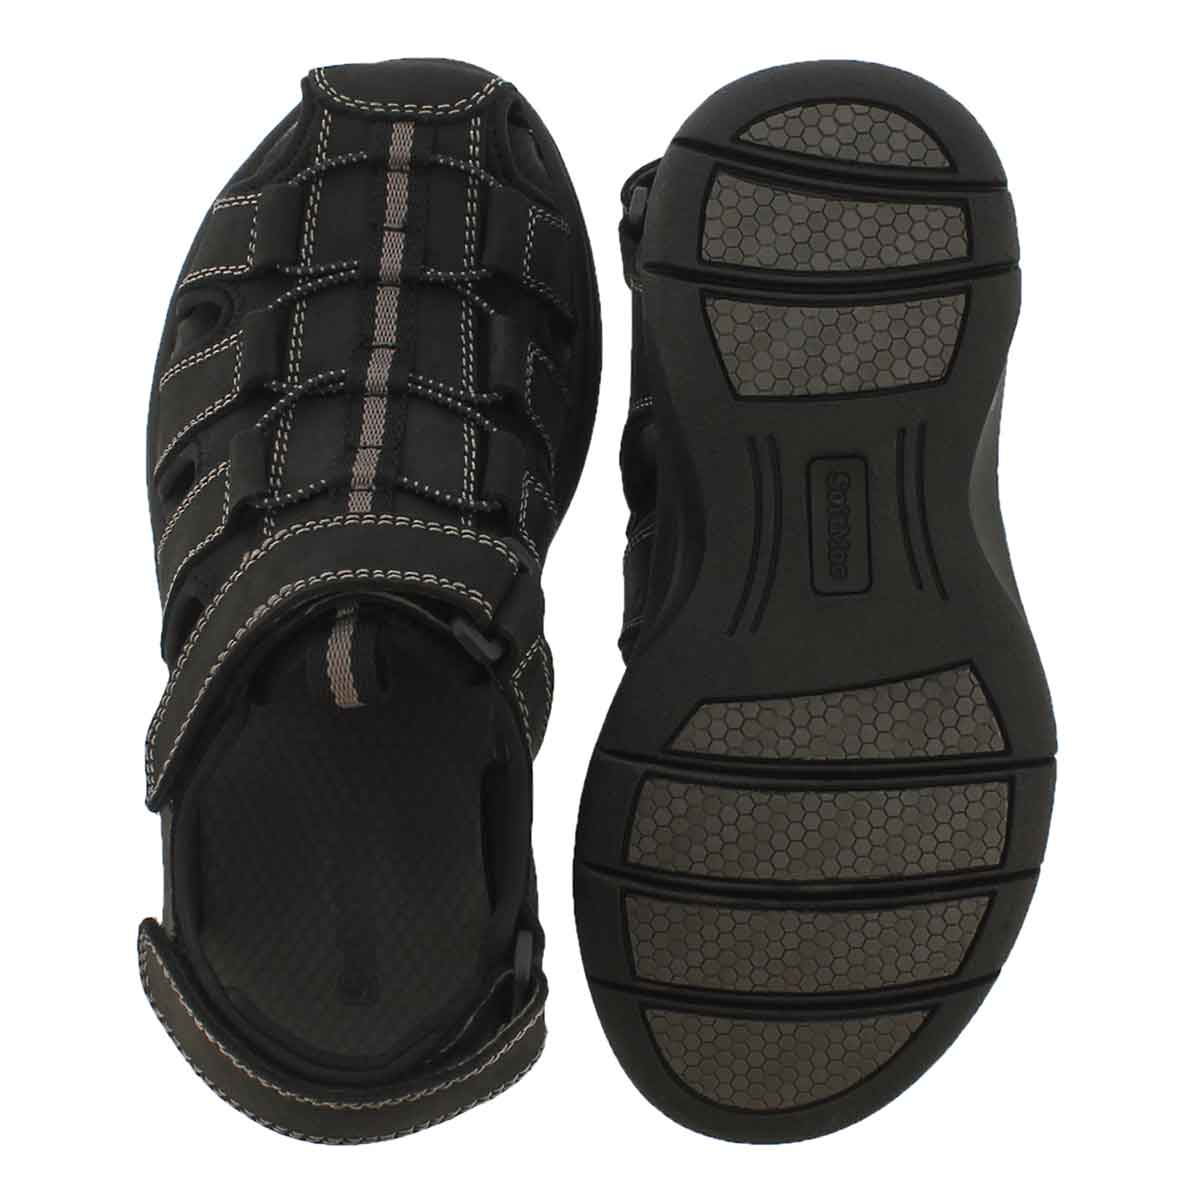 Mns Linus black fisherman sandal